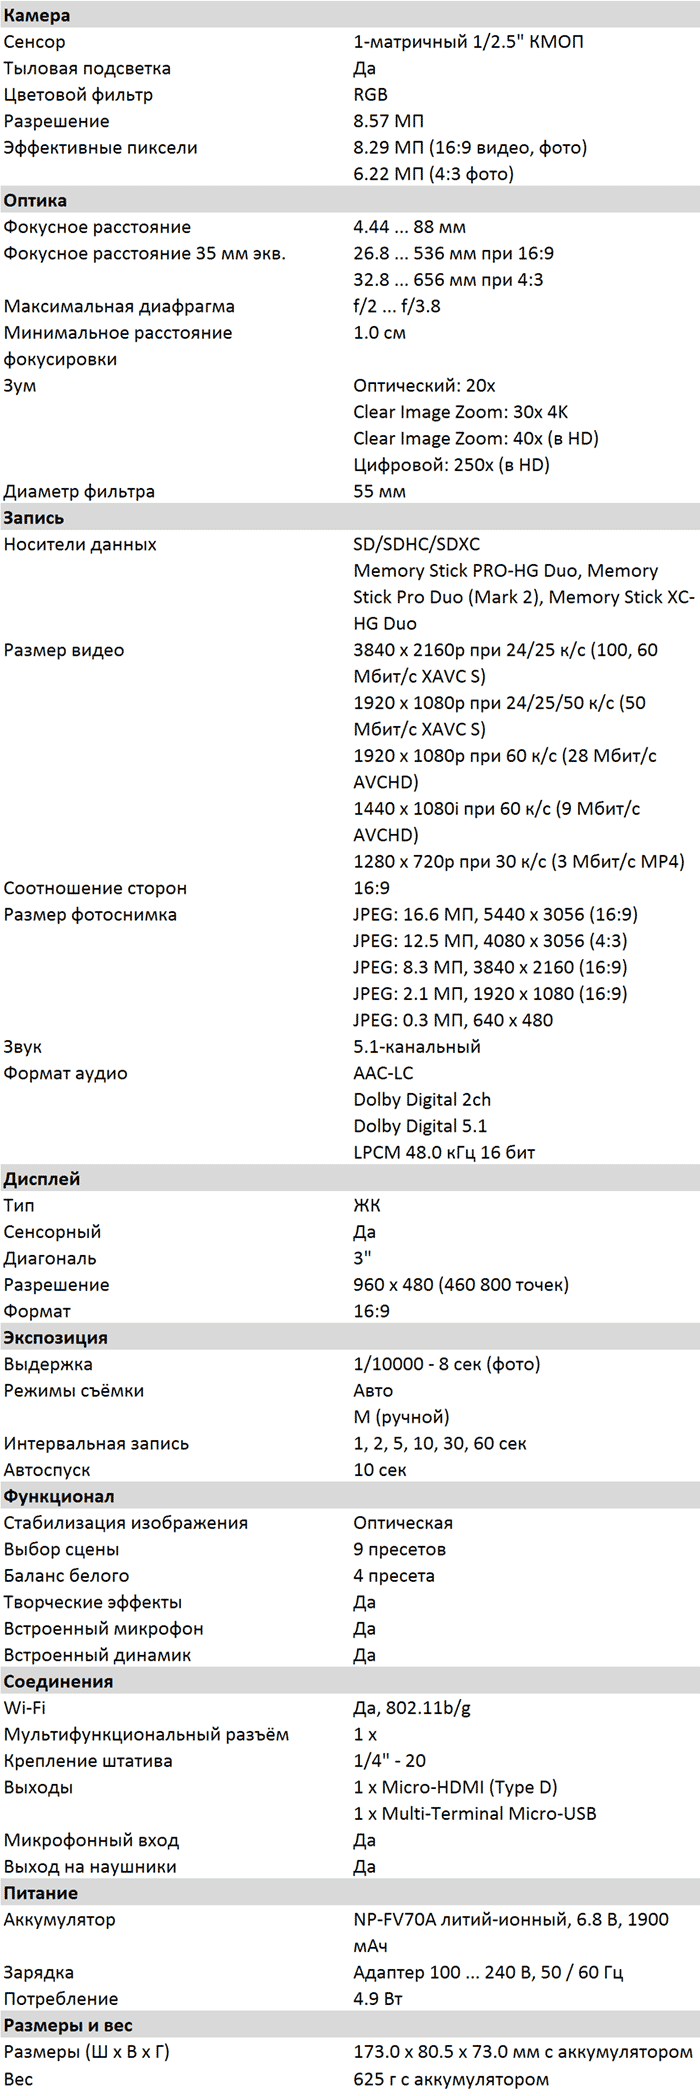 Характеристики AX43